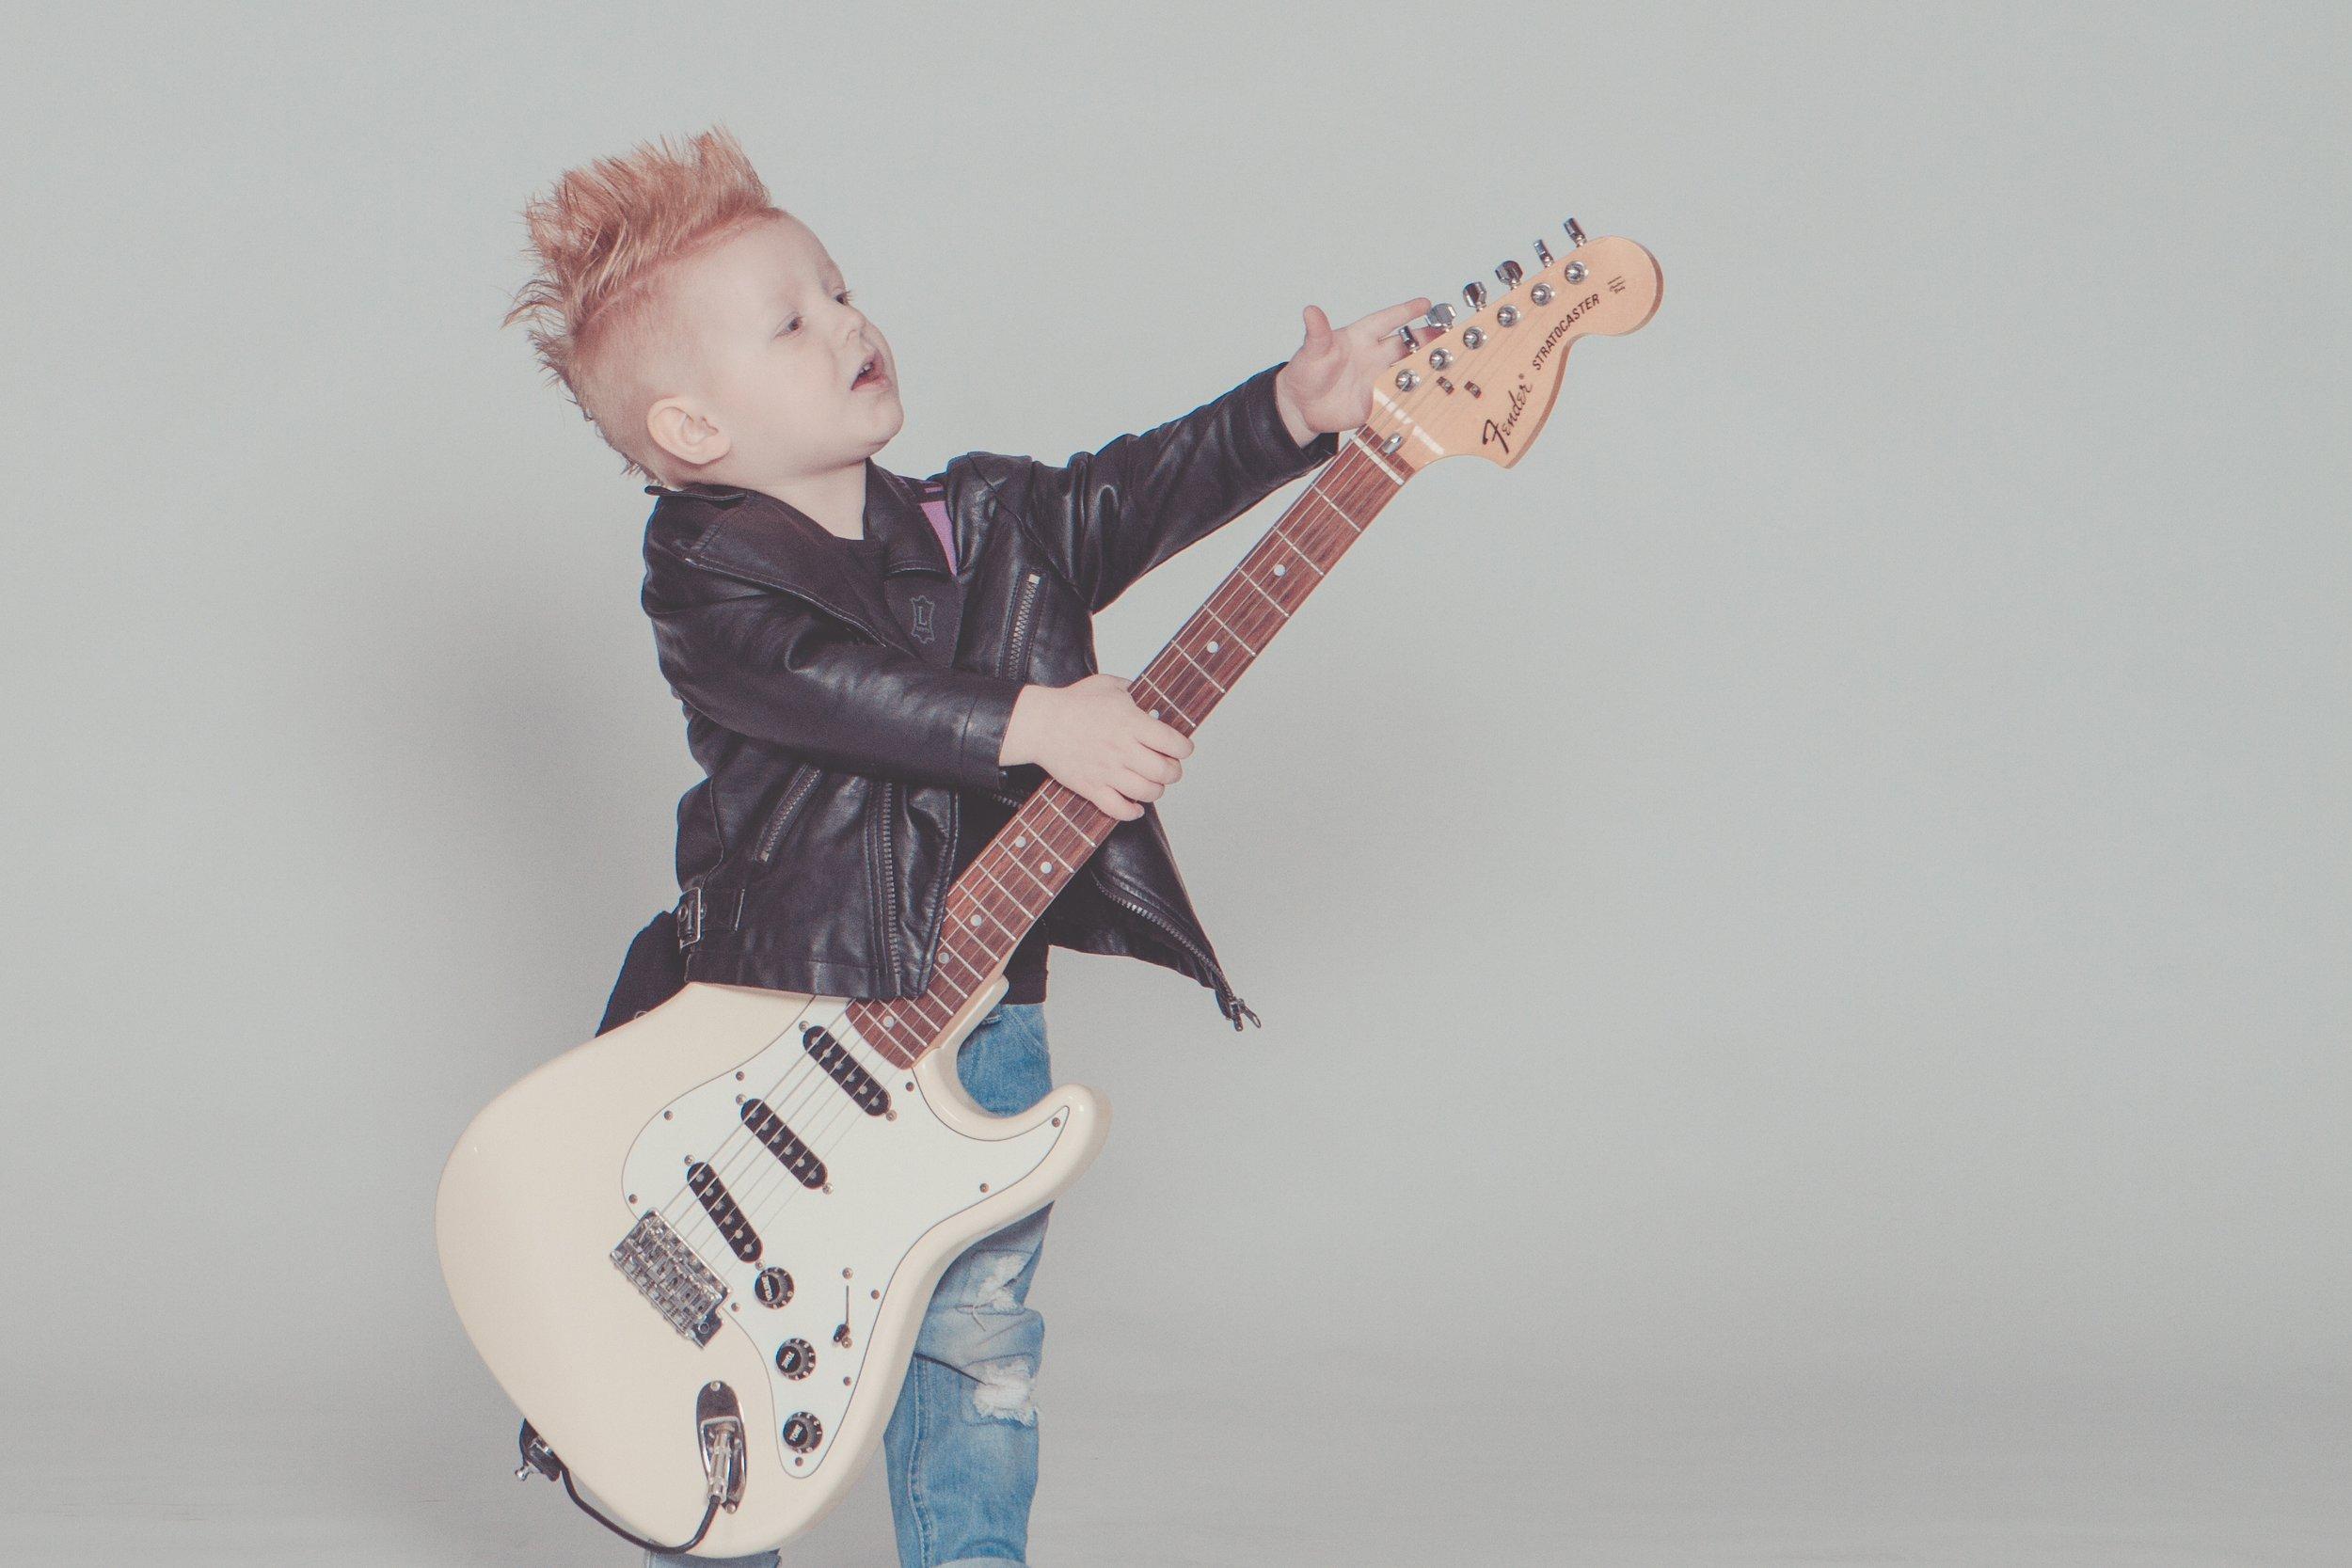 Kid with guitar.jpeg